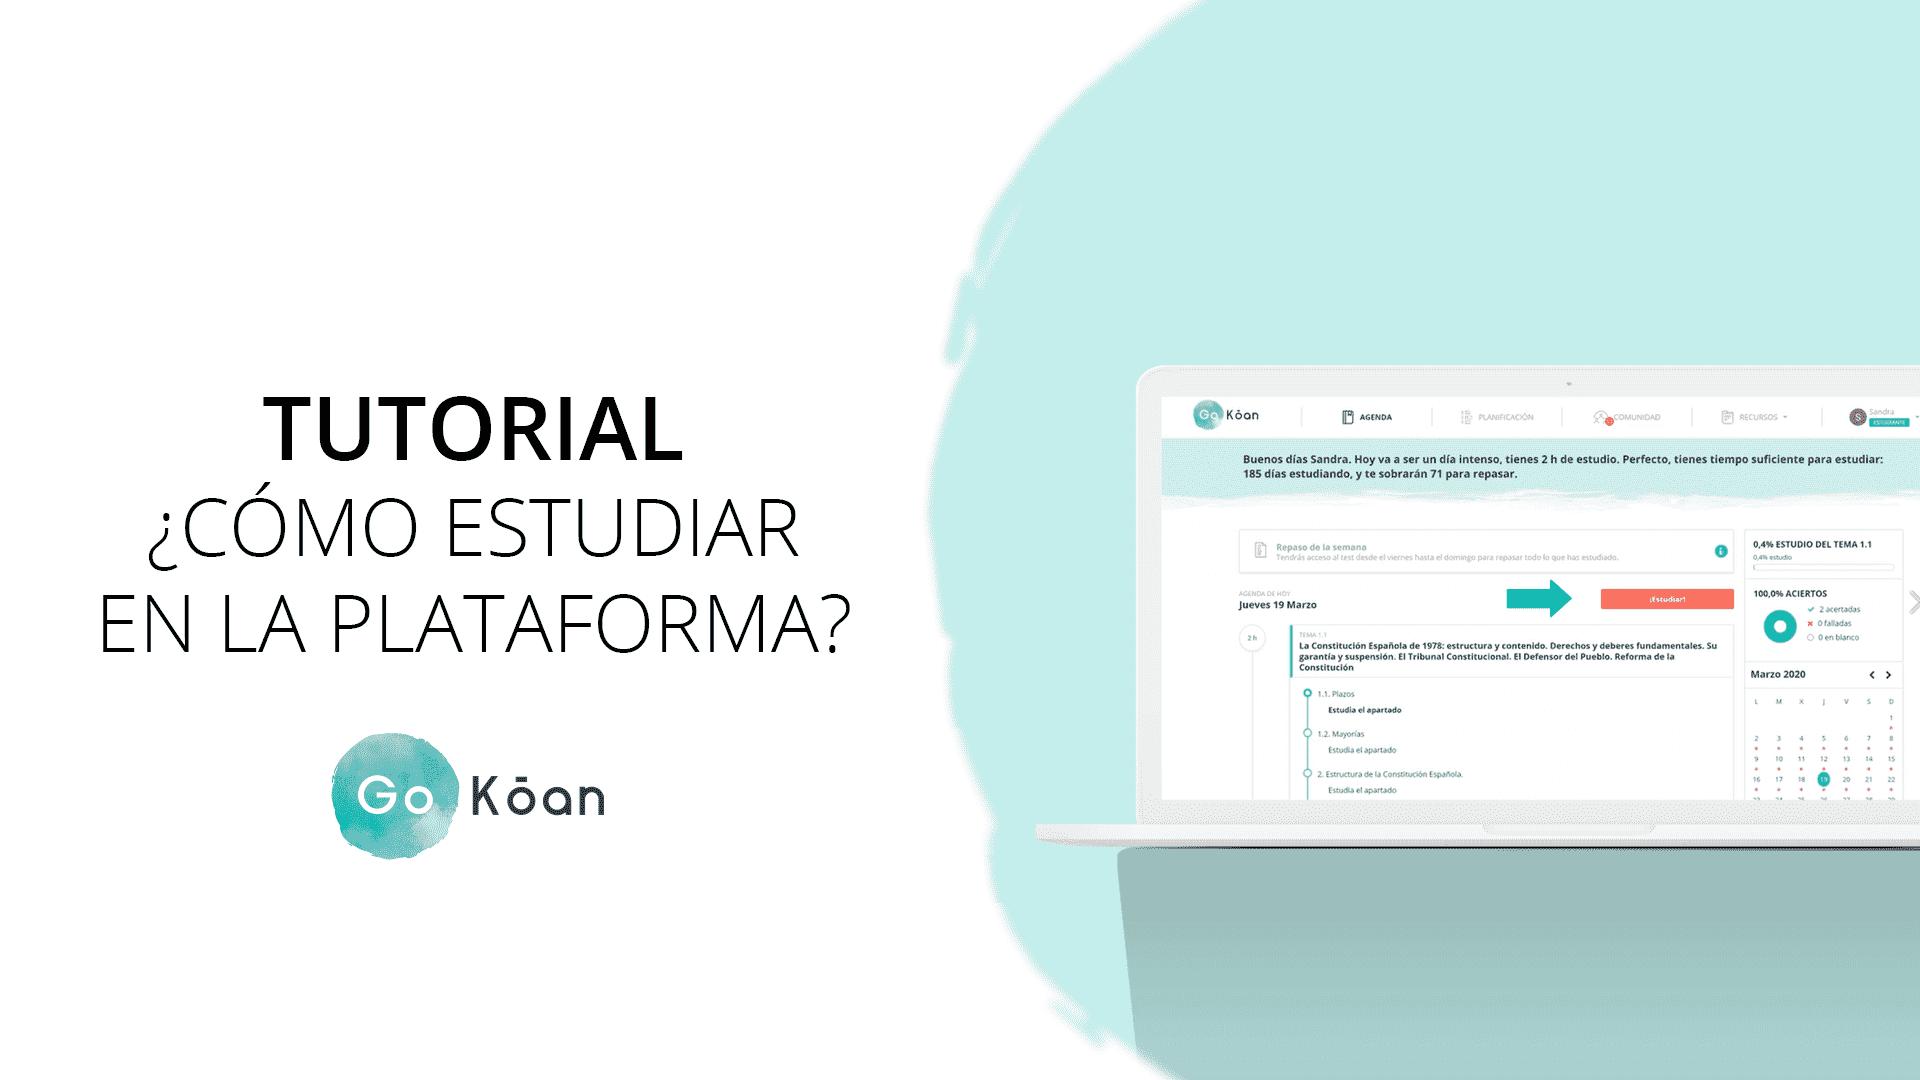 como-estudiar-plataforma-gokoan-metodo-gokoan